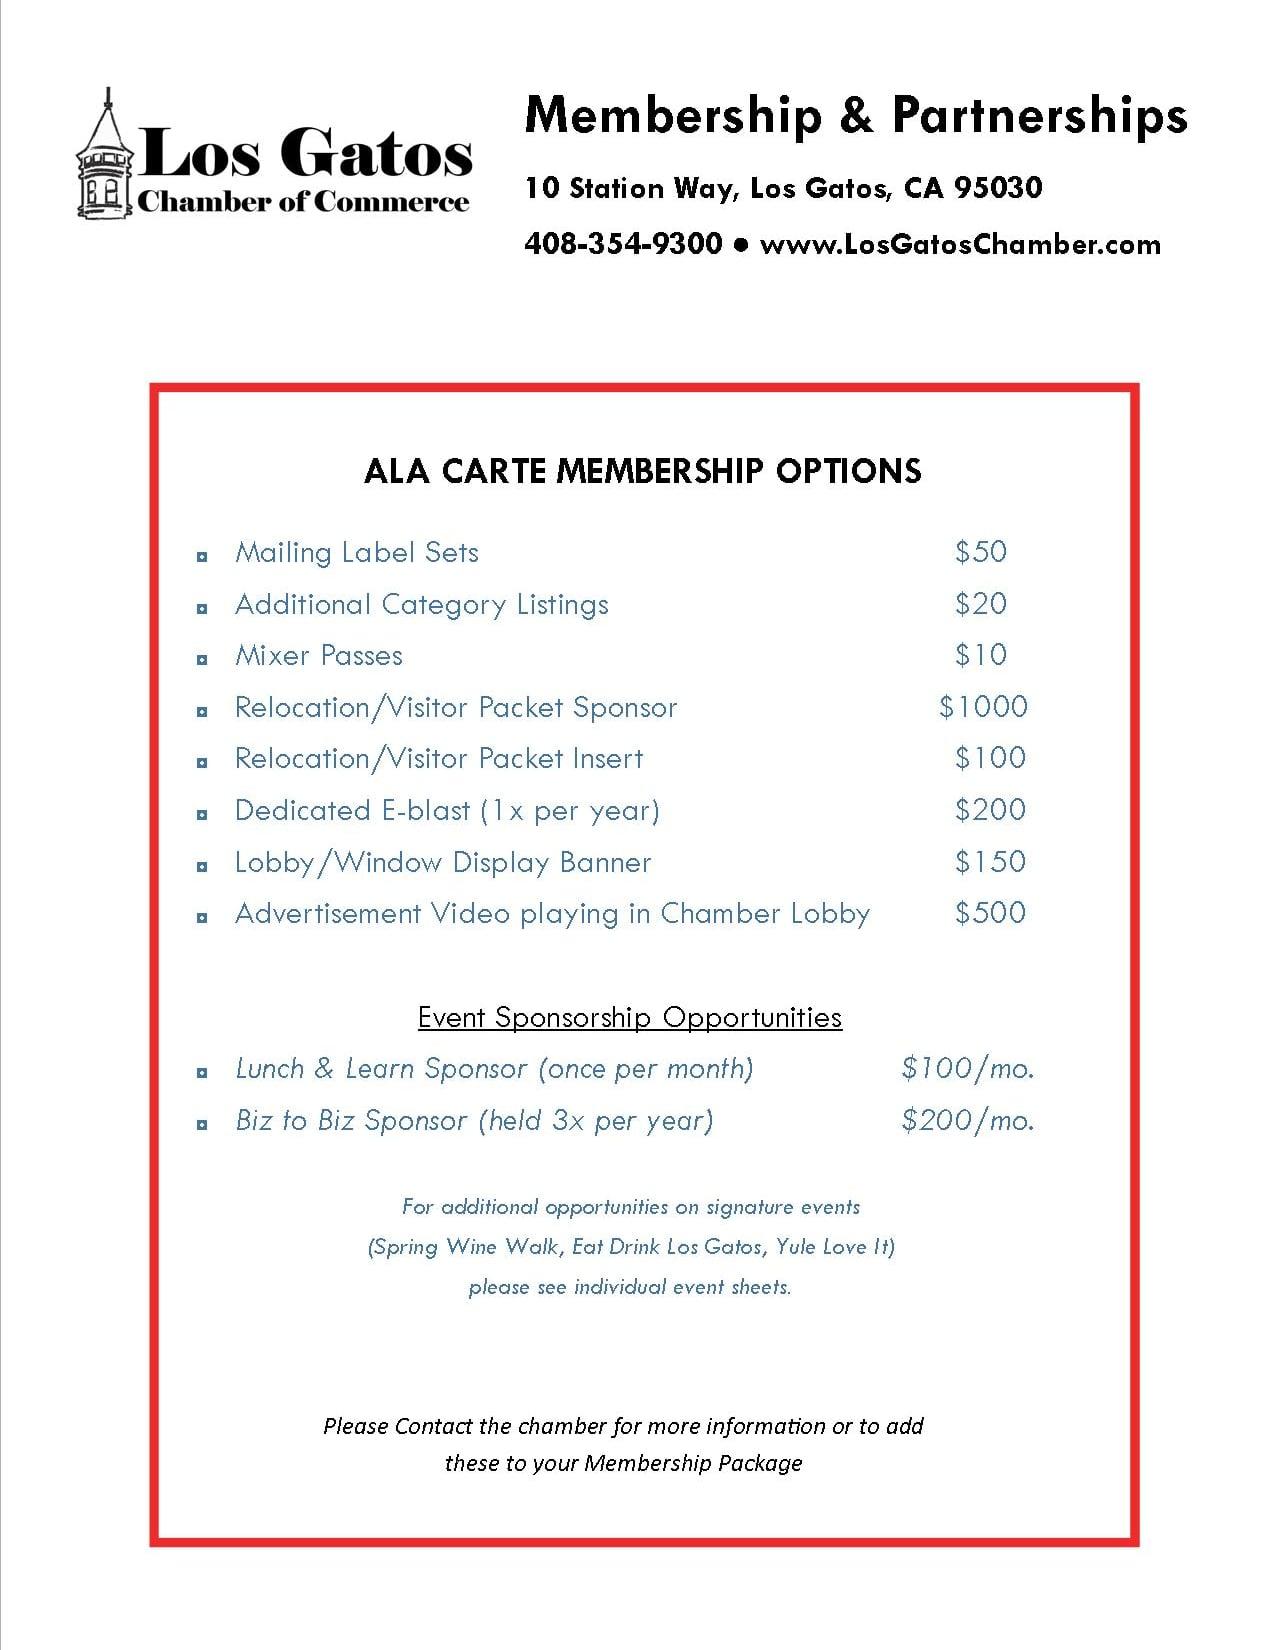 Membership-Levels-2018-alacarte-w1275.jpg